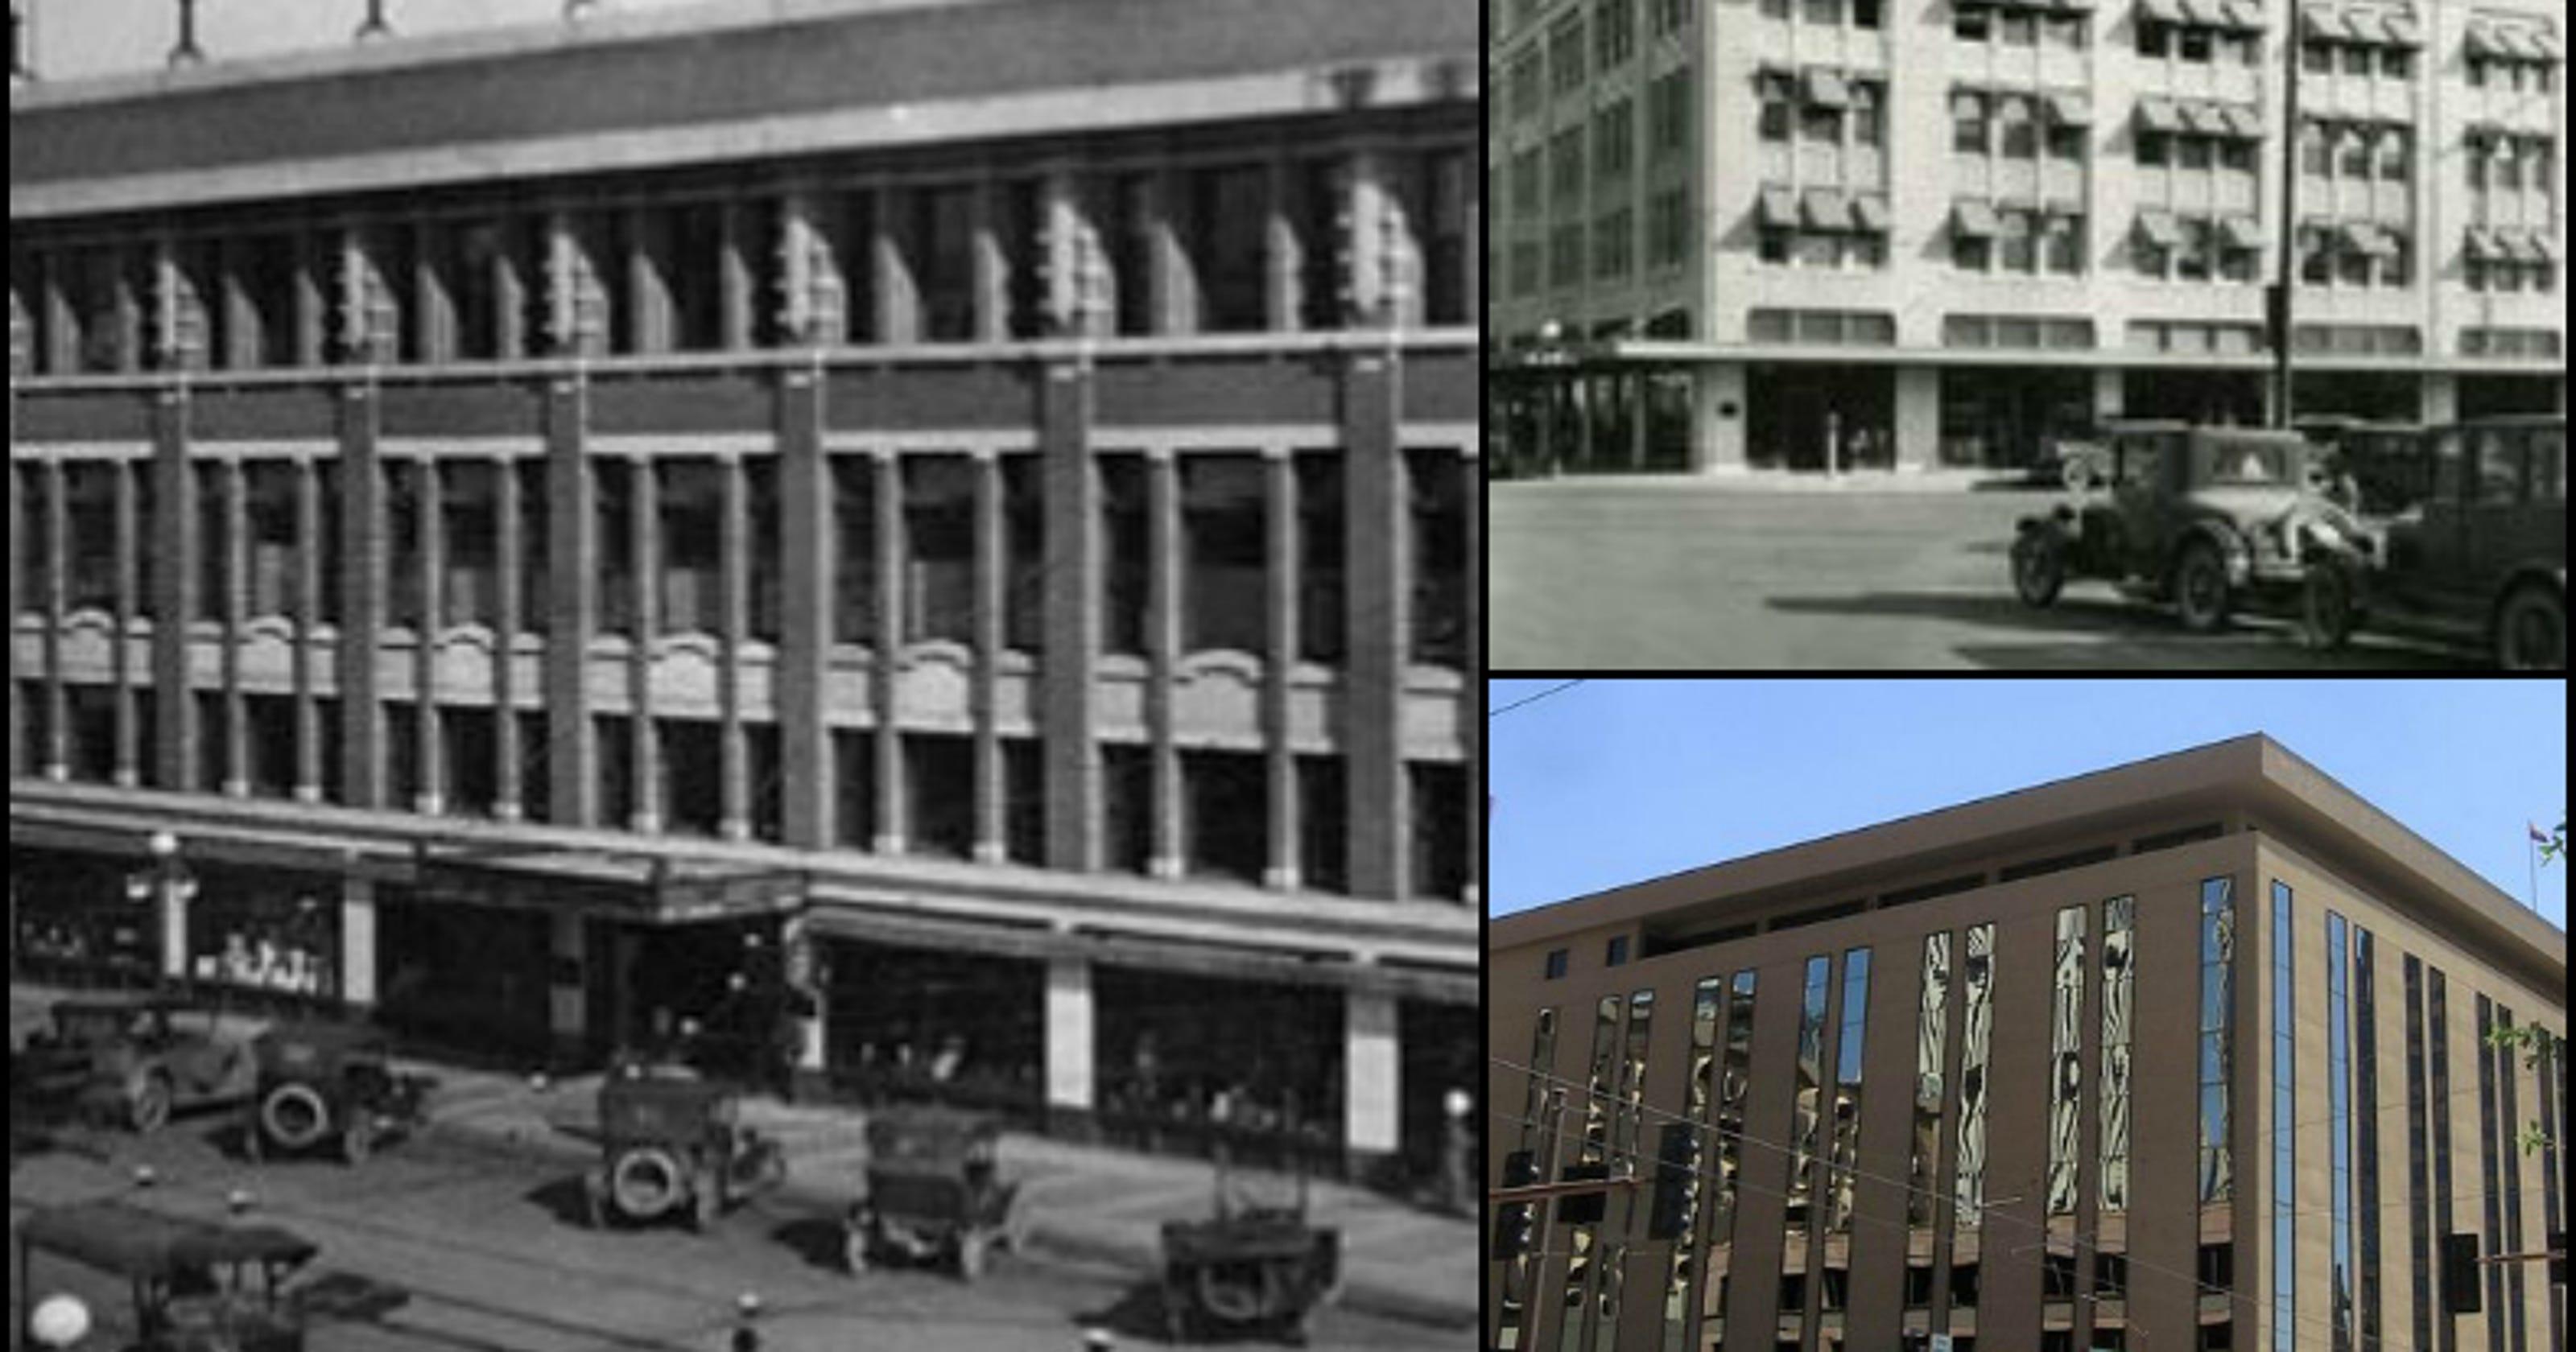 Phoenix history: What's beneath that stucco?